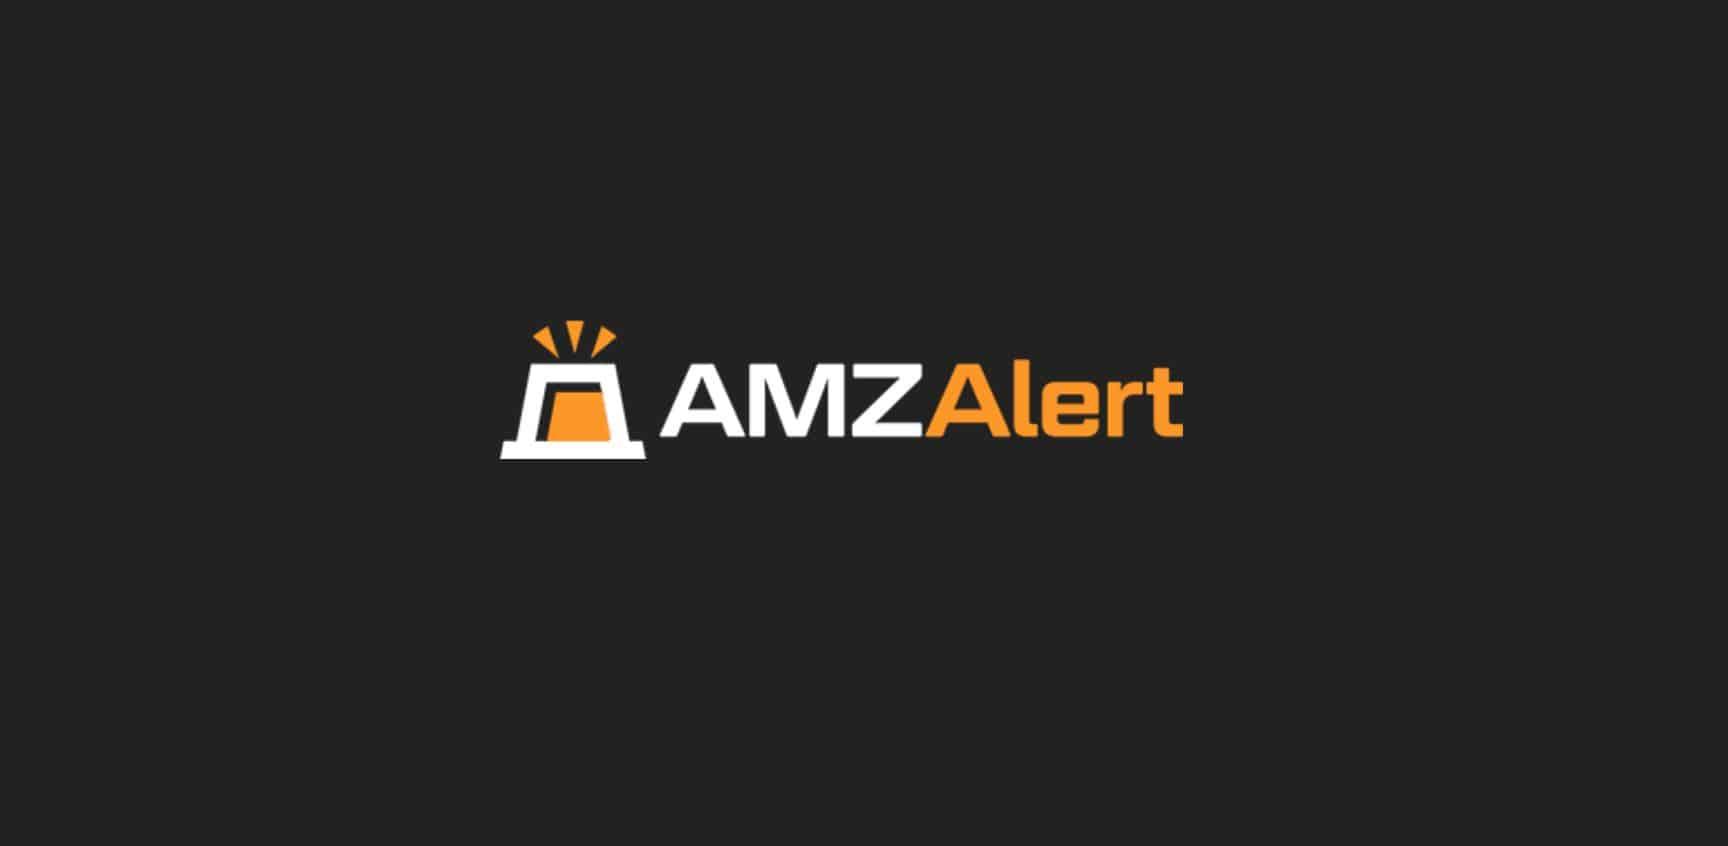 AMZalert: Is It The Leading Amazon Monitoring Software?